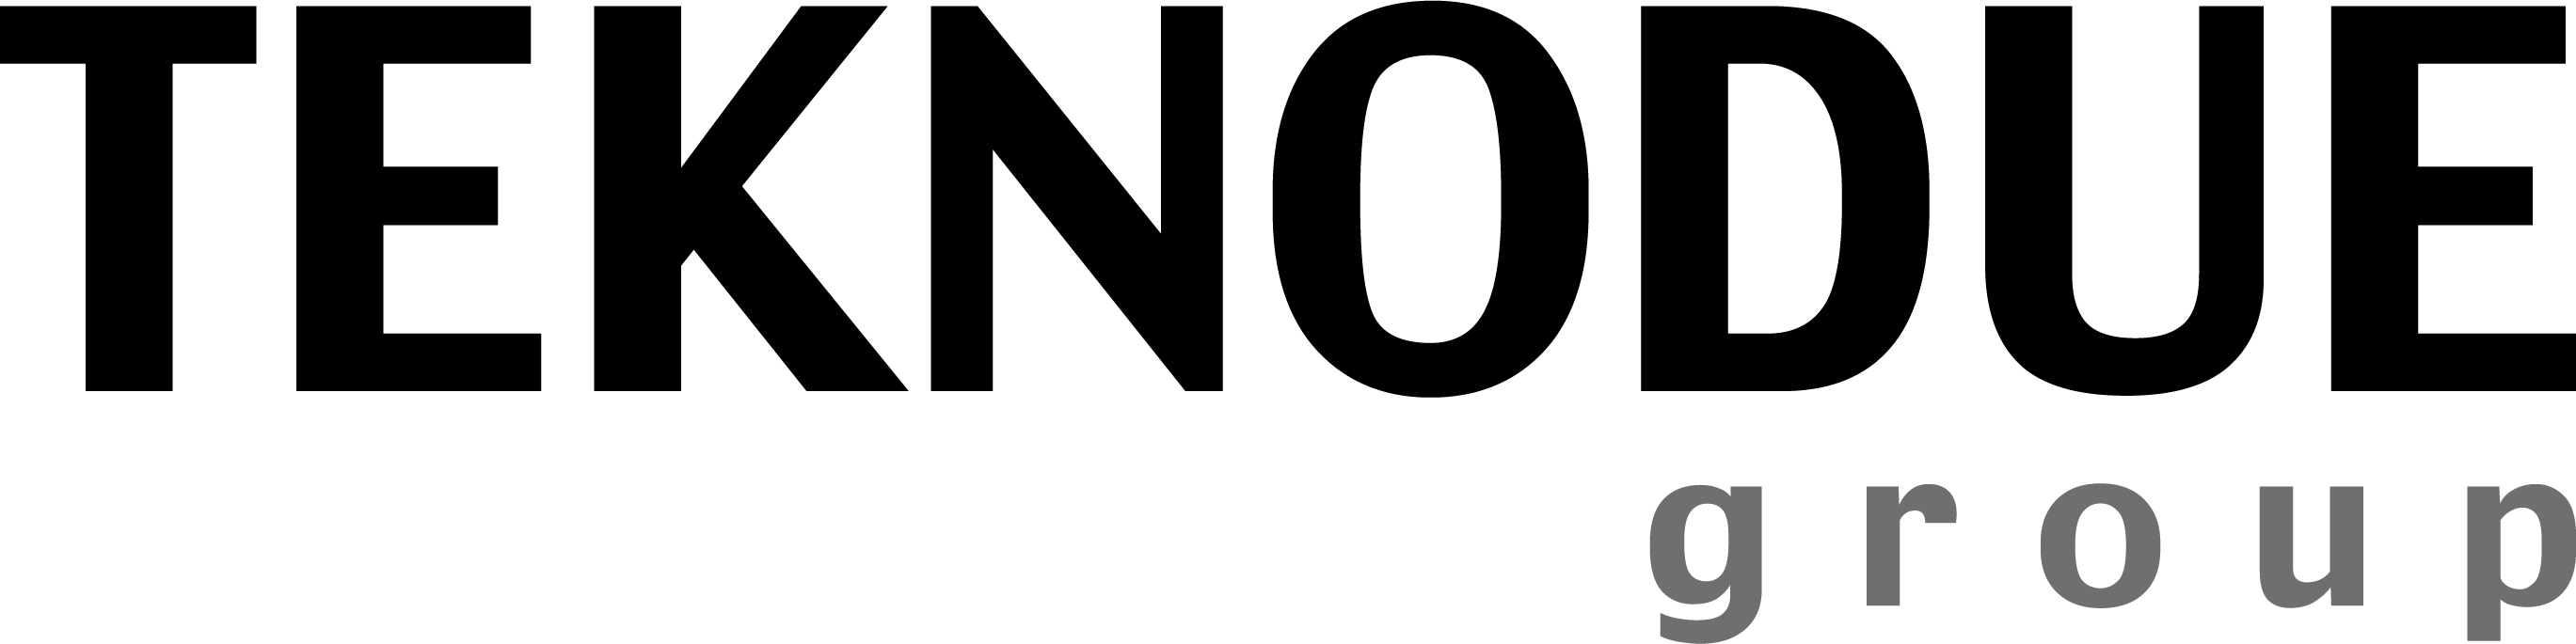 Teknodue Group S.N.C.